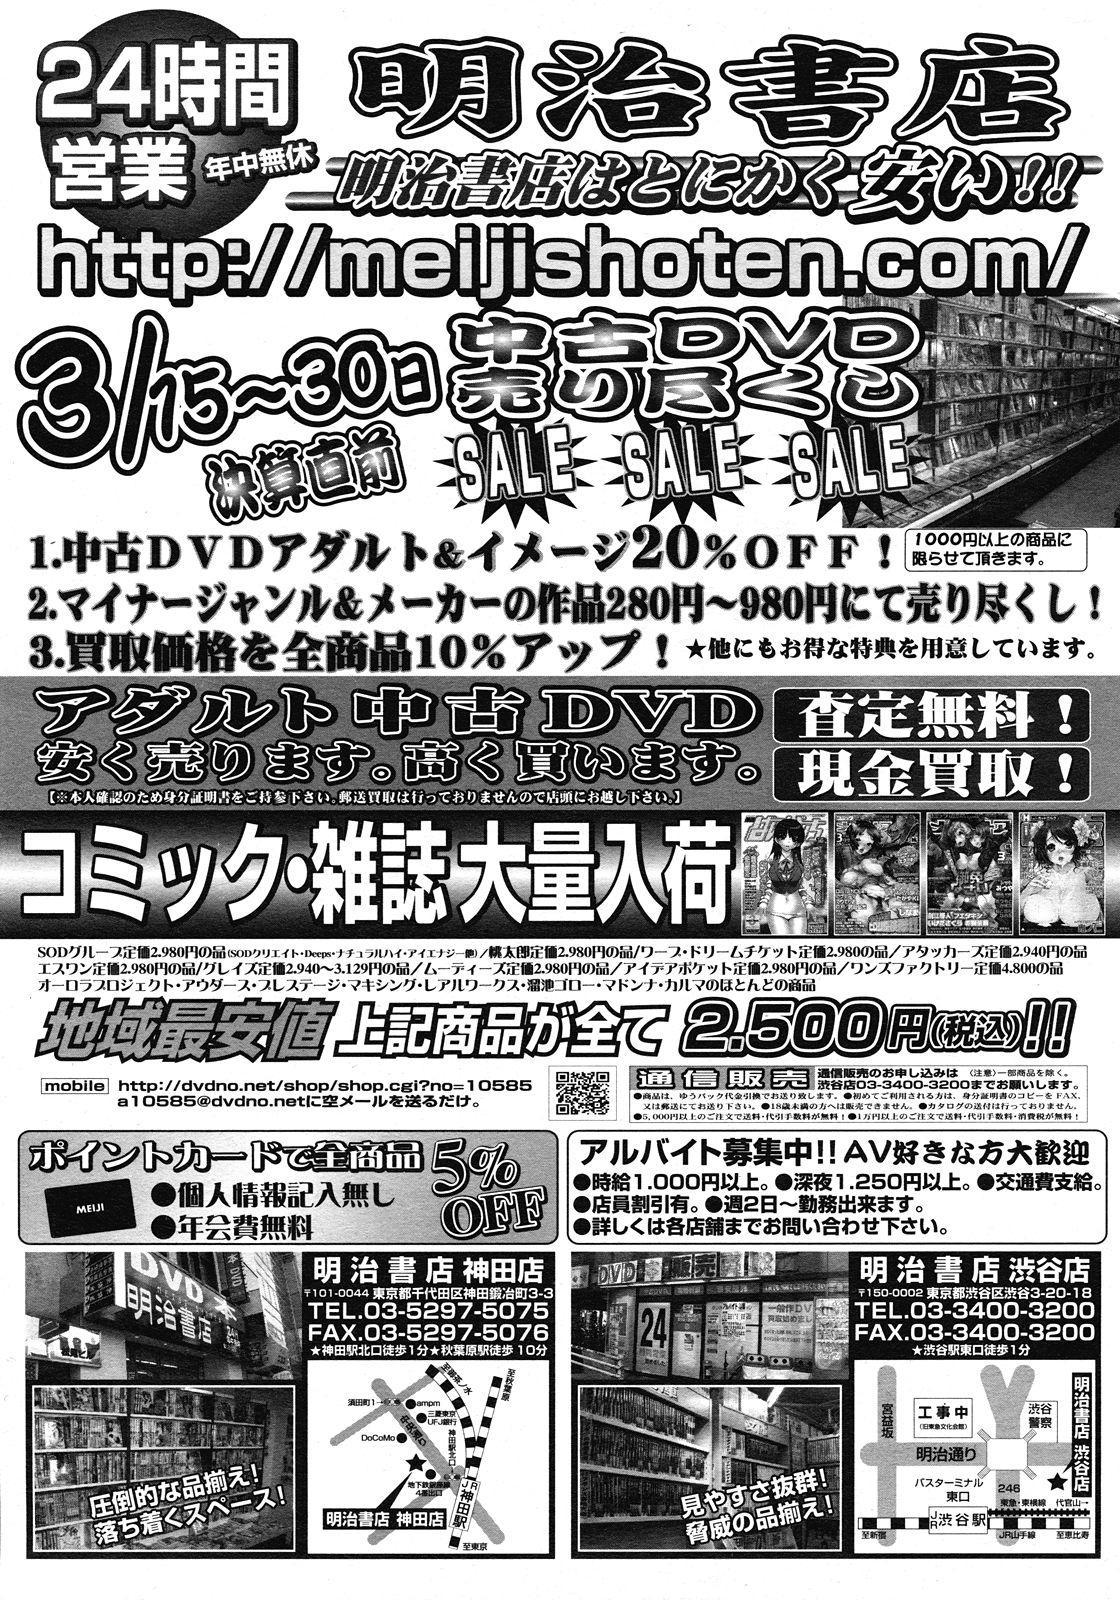 COMIC Megastore 2008-05 456